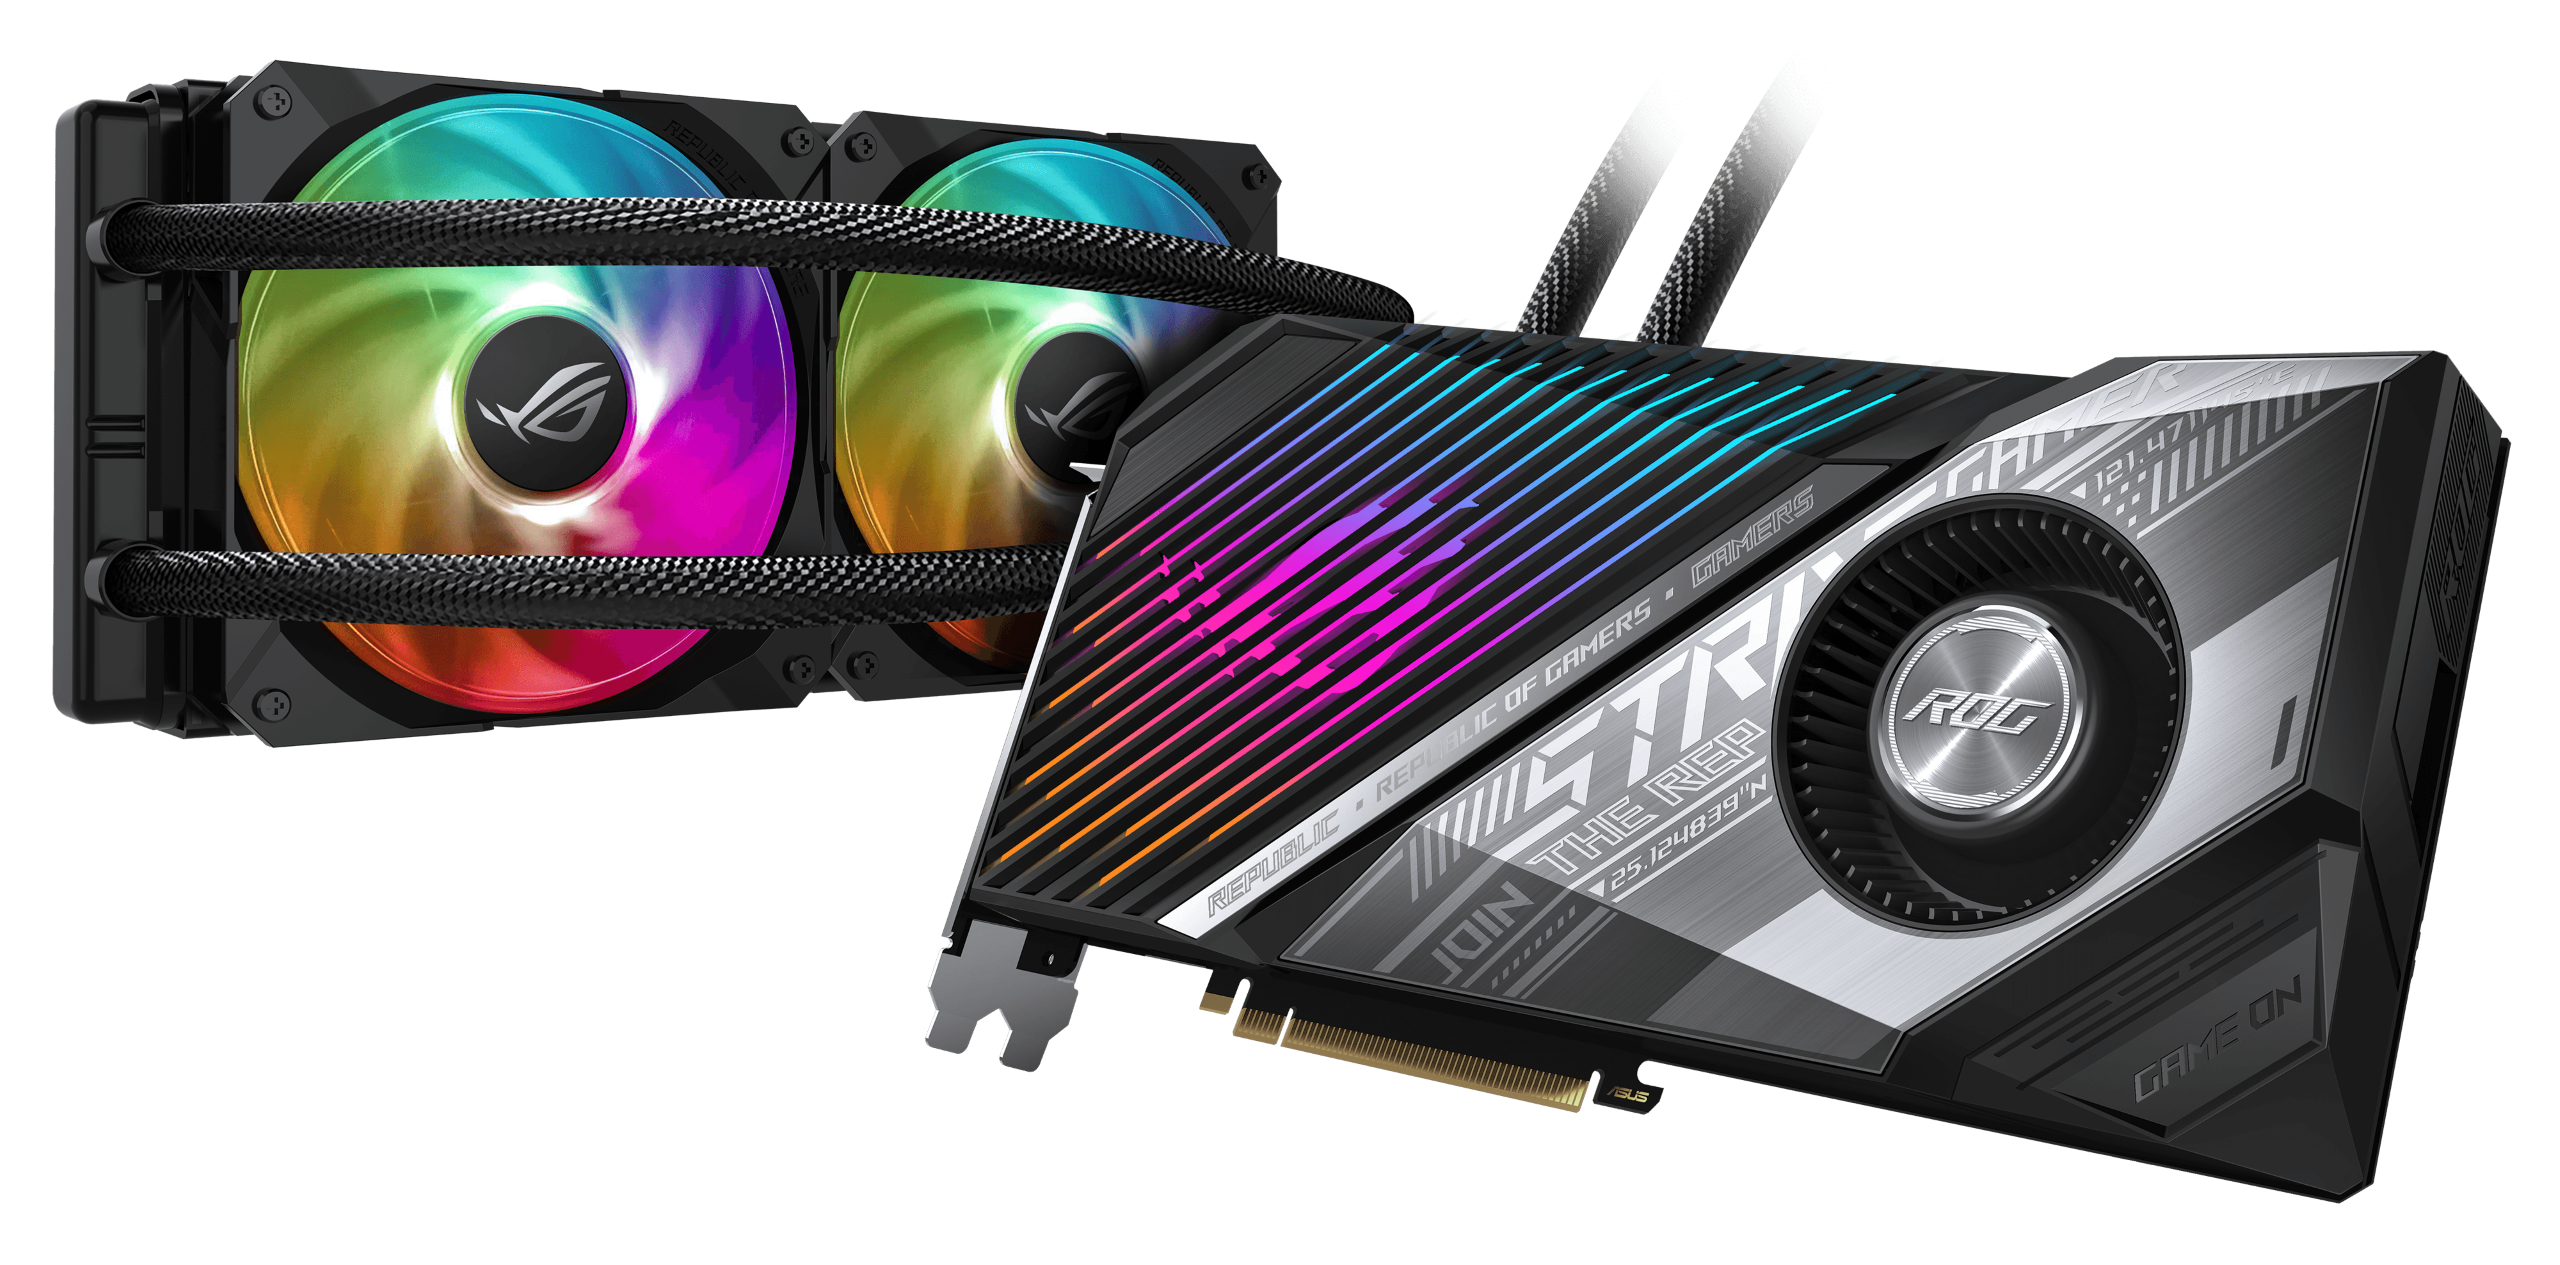 Asus ROG Strix LC Radeon RX 6800 XT_1